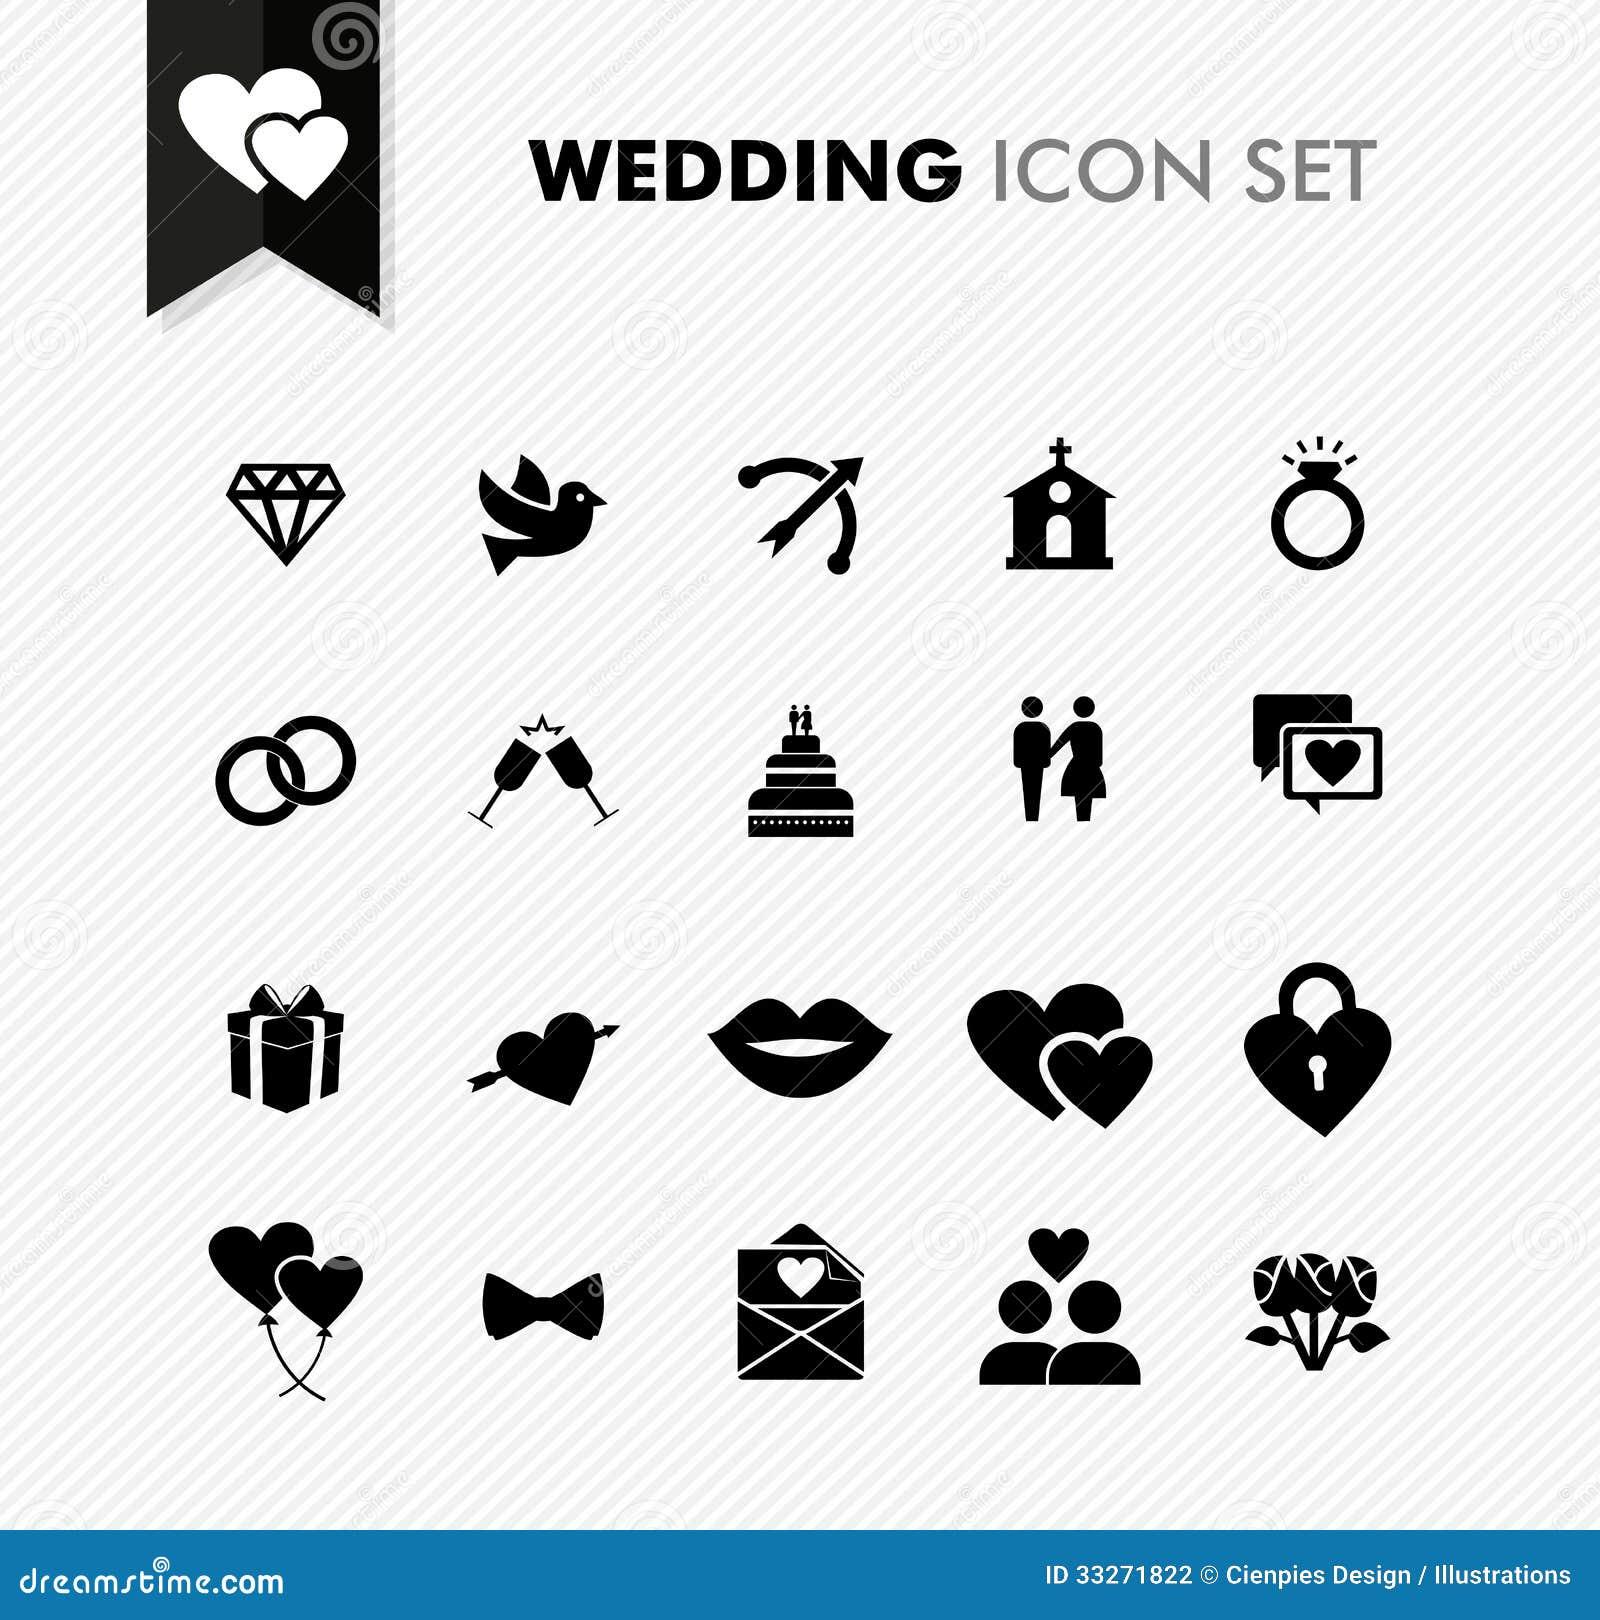 Wedding fresh icon set.